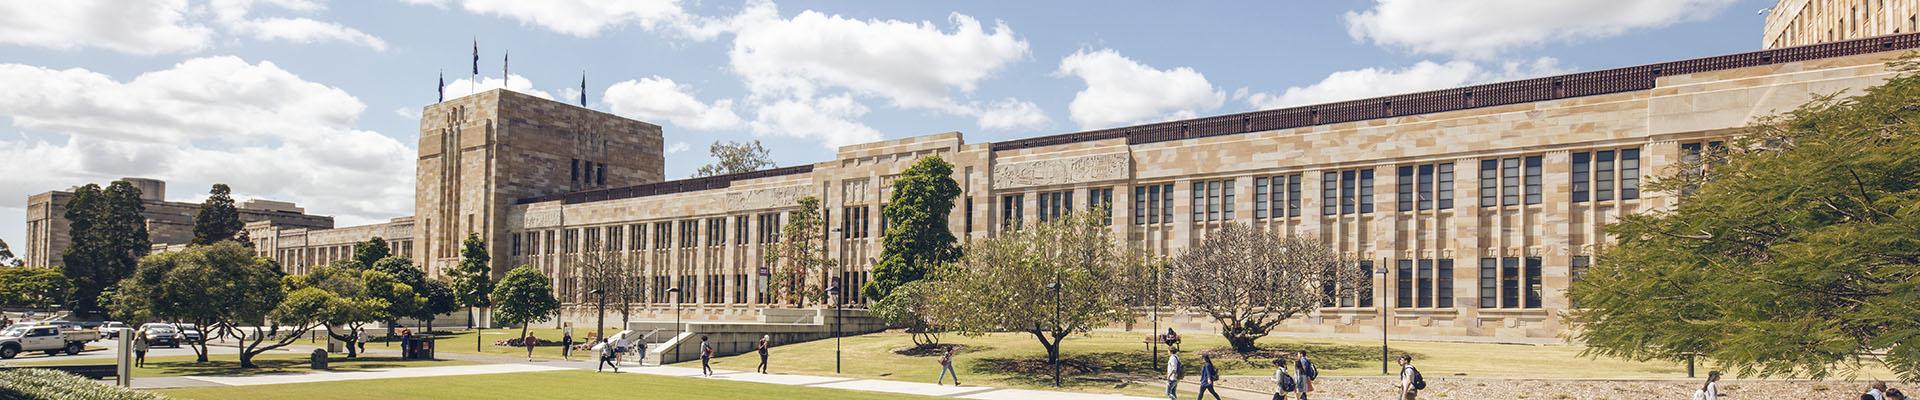 The University of Queensland | World University Rankings | THE